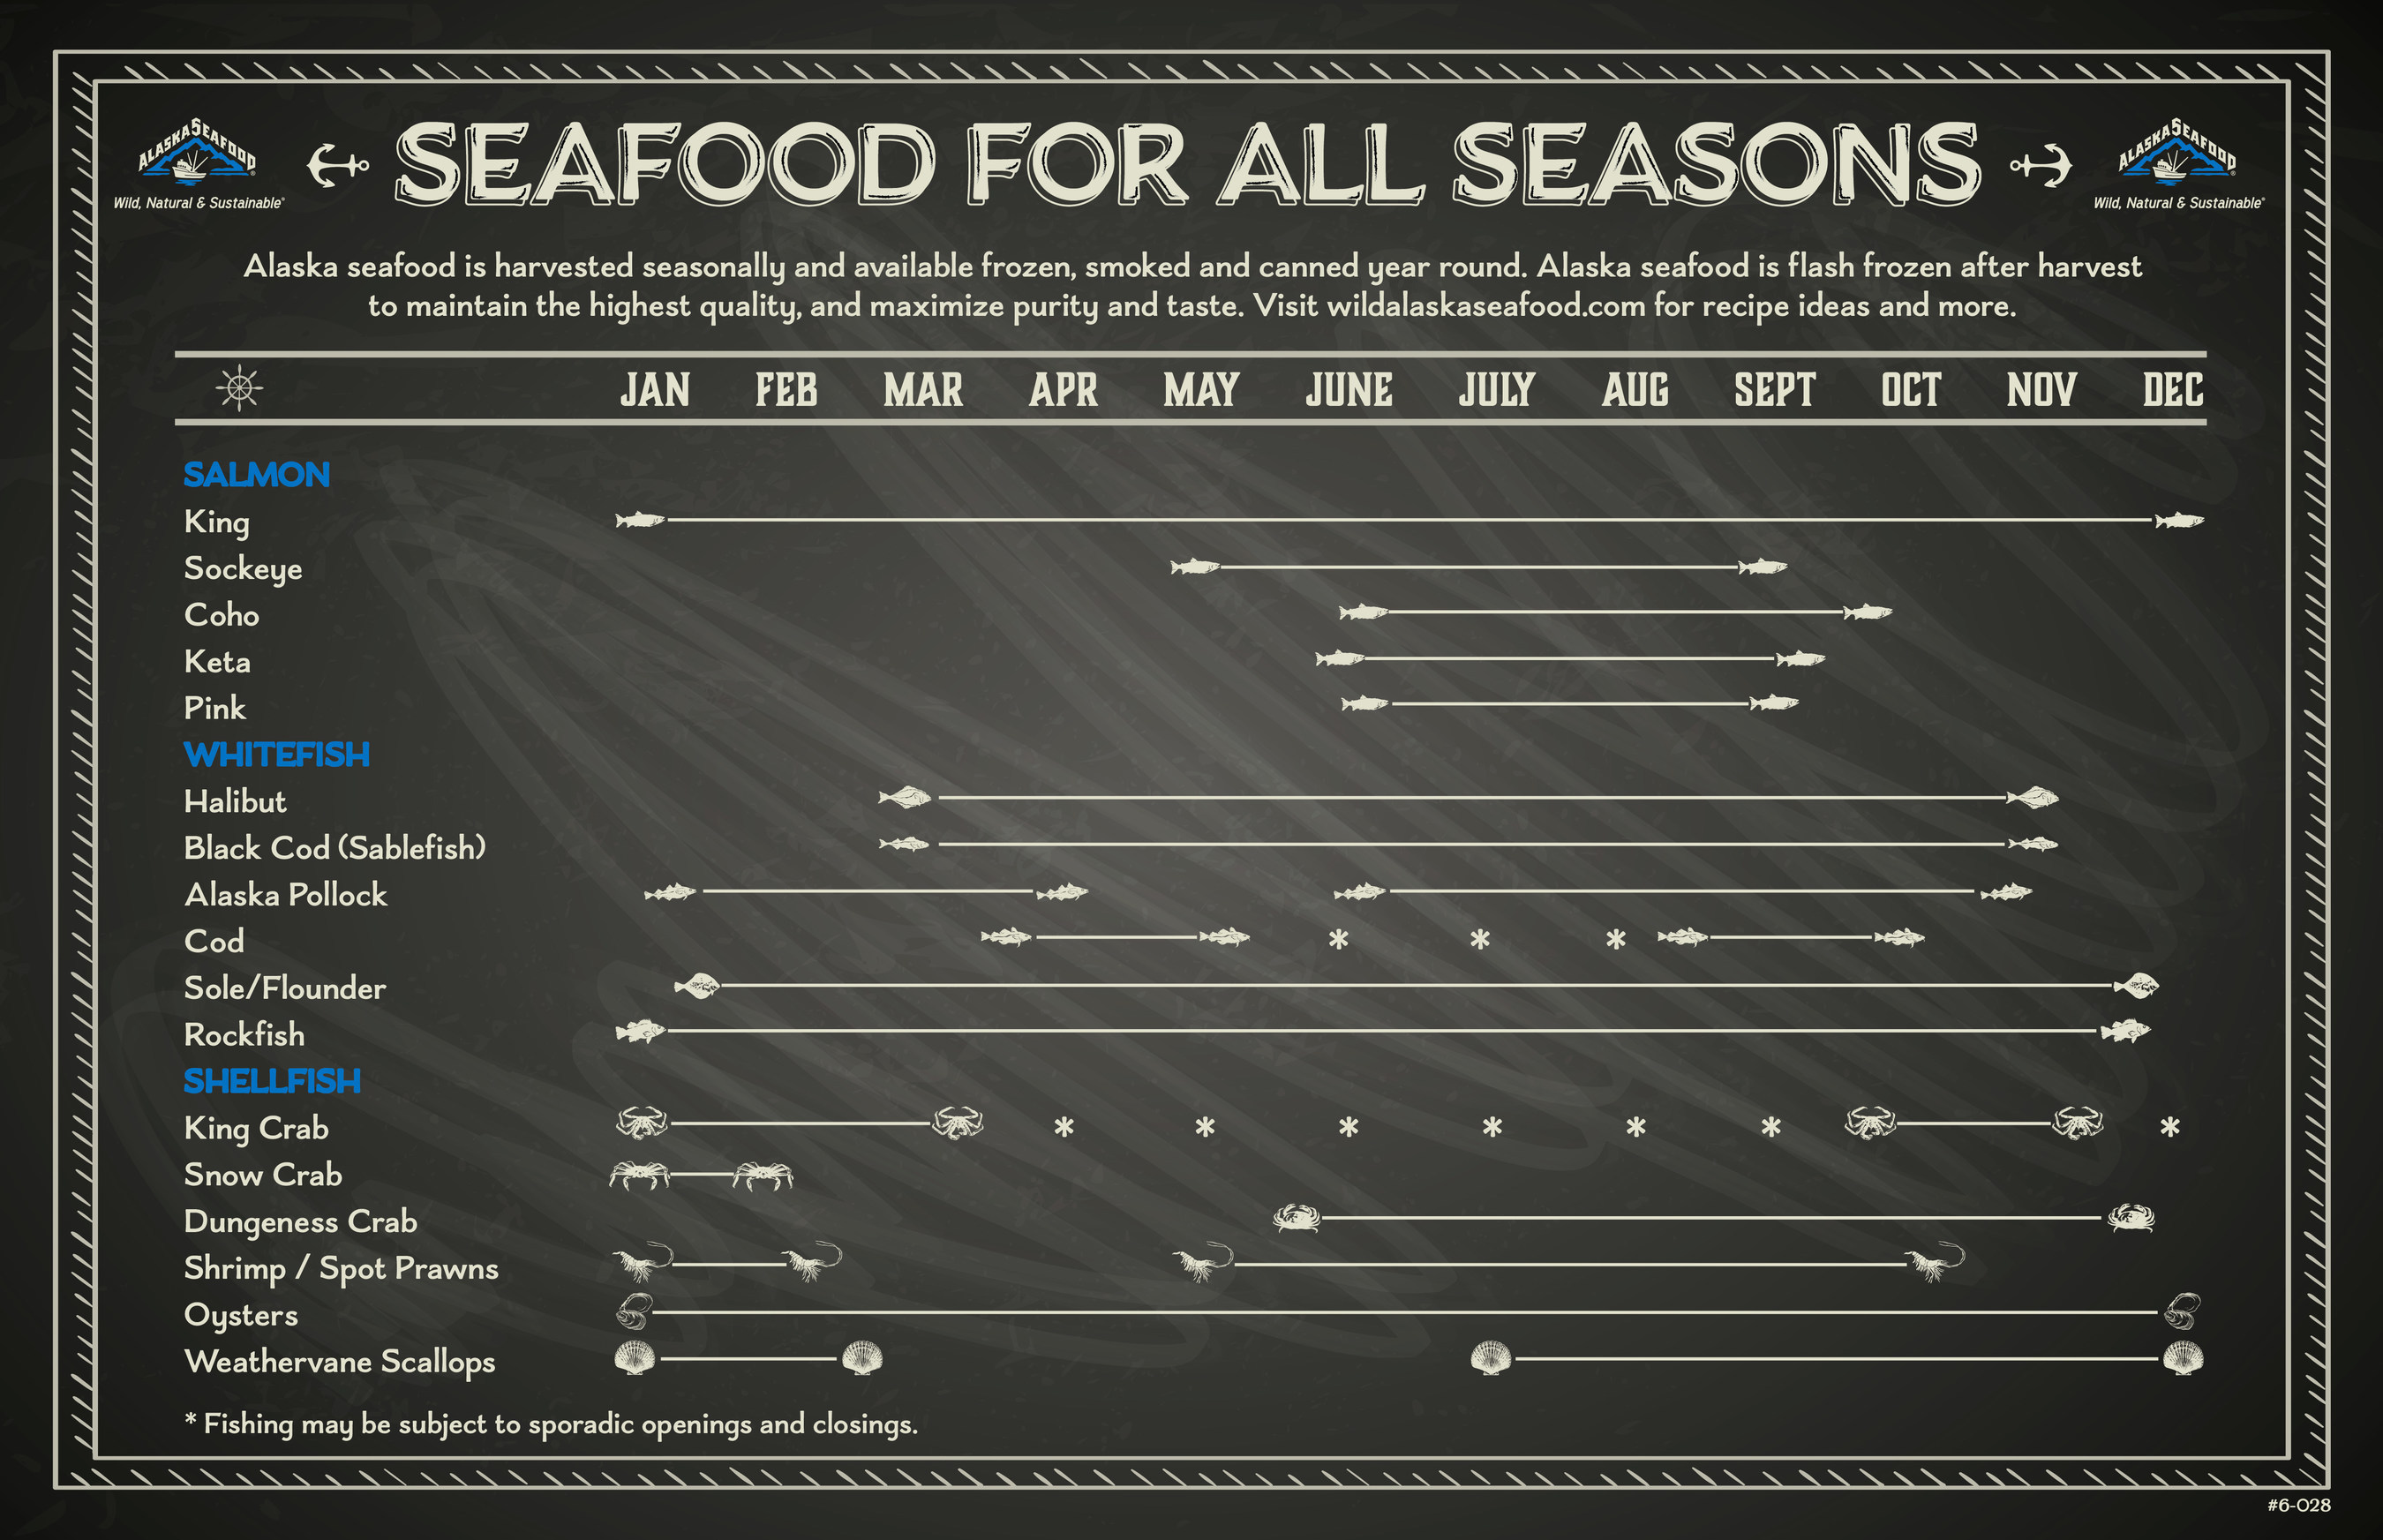 alaska seafood marketing institute releases seasonal harvest guide